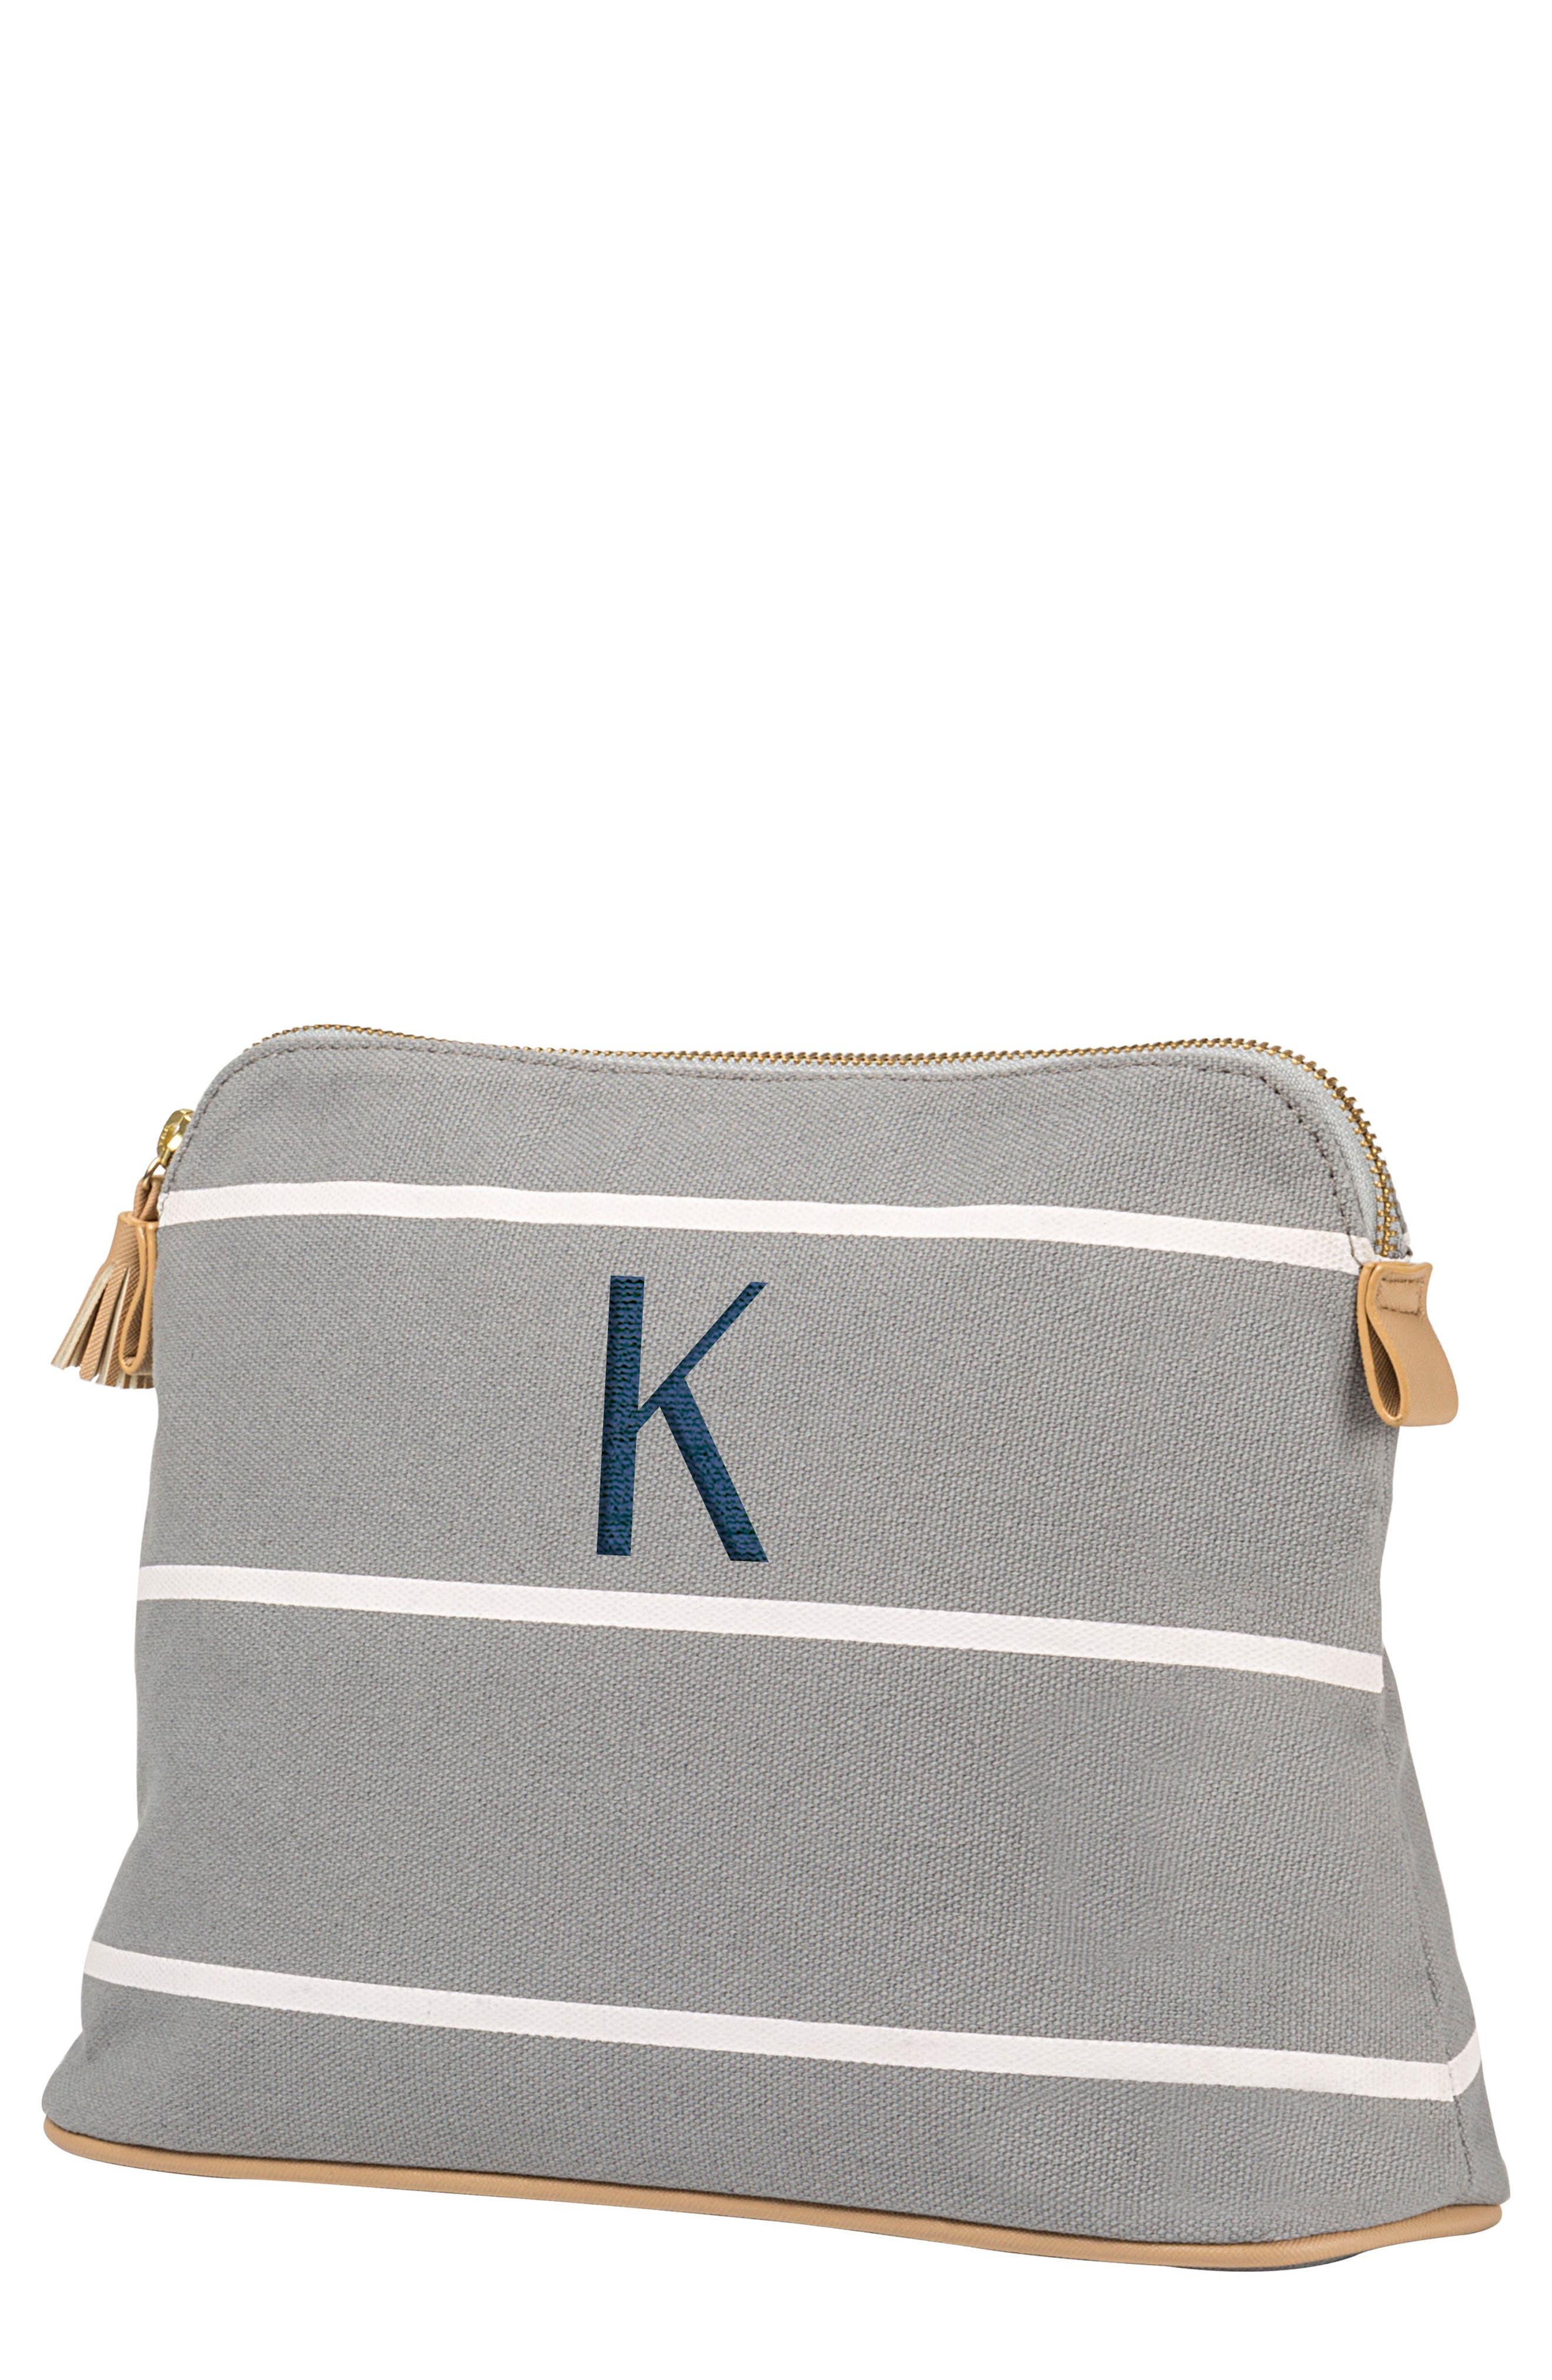 Monogram Cosmetics Bag,                         Main,                         color, Grey